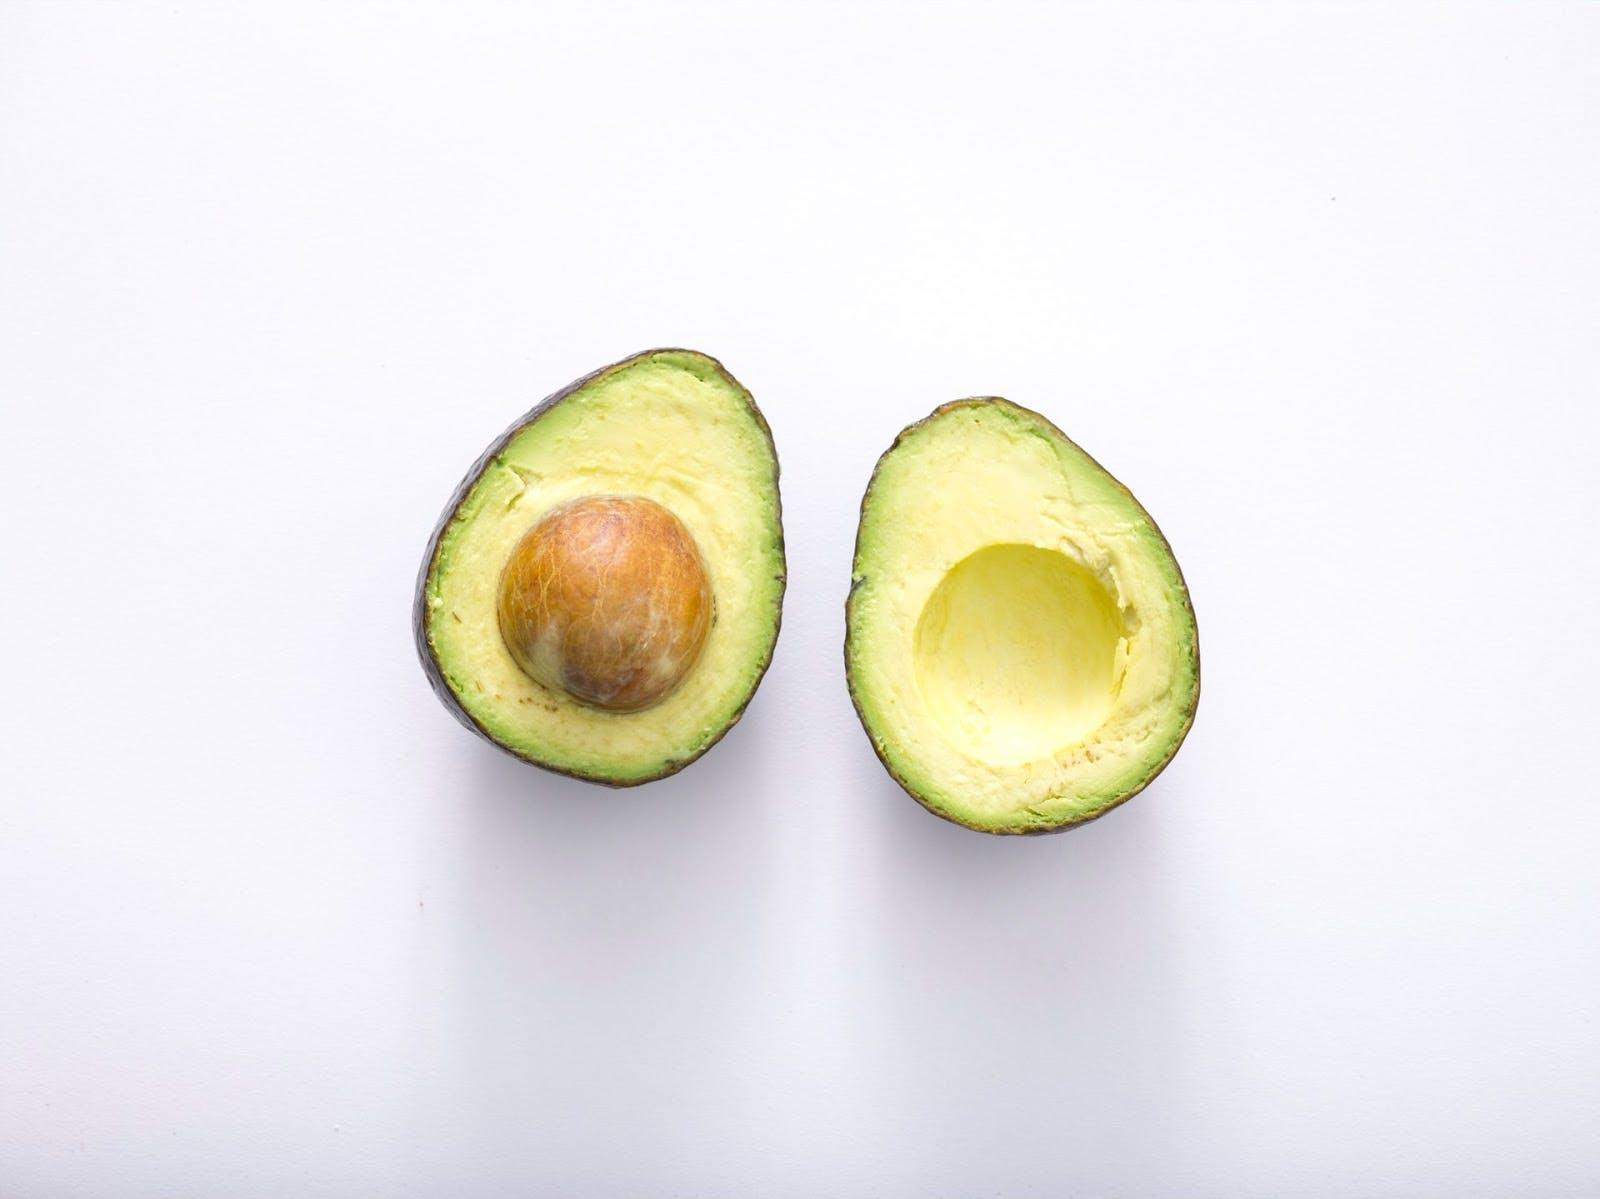 two avocado halves